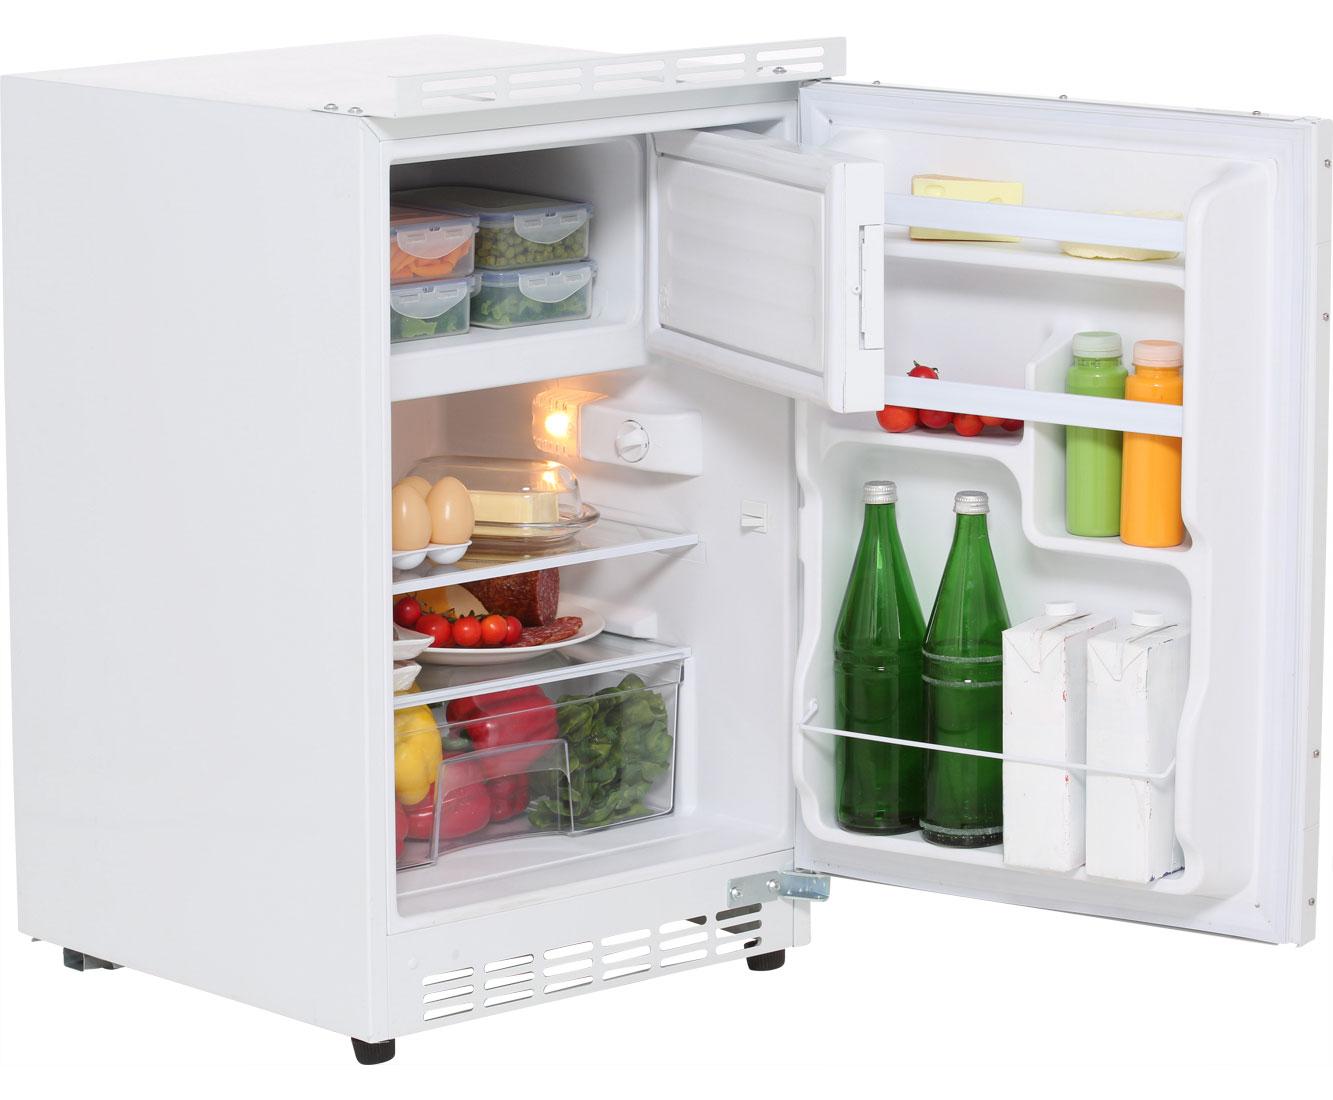 Kühlschrank Retro Unterbau : Gorenje ru a kühlschrank unterbau cm weiß neu ebay